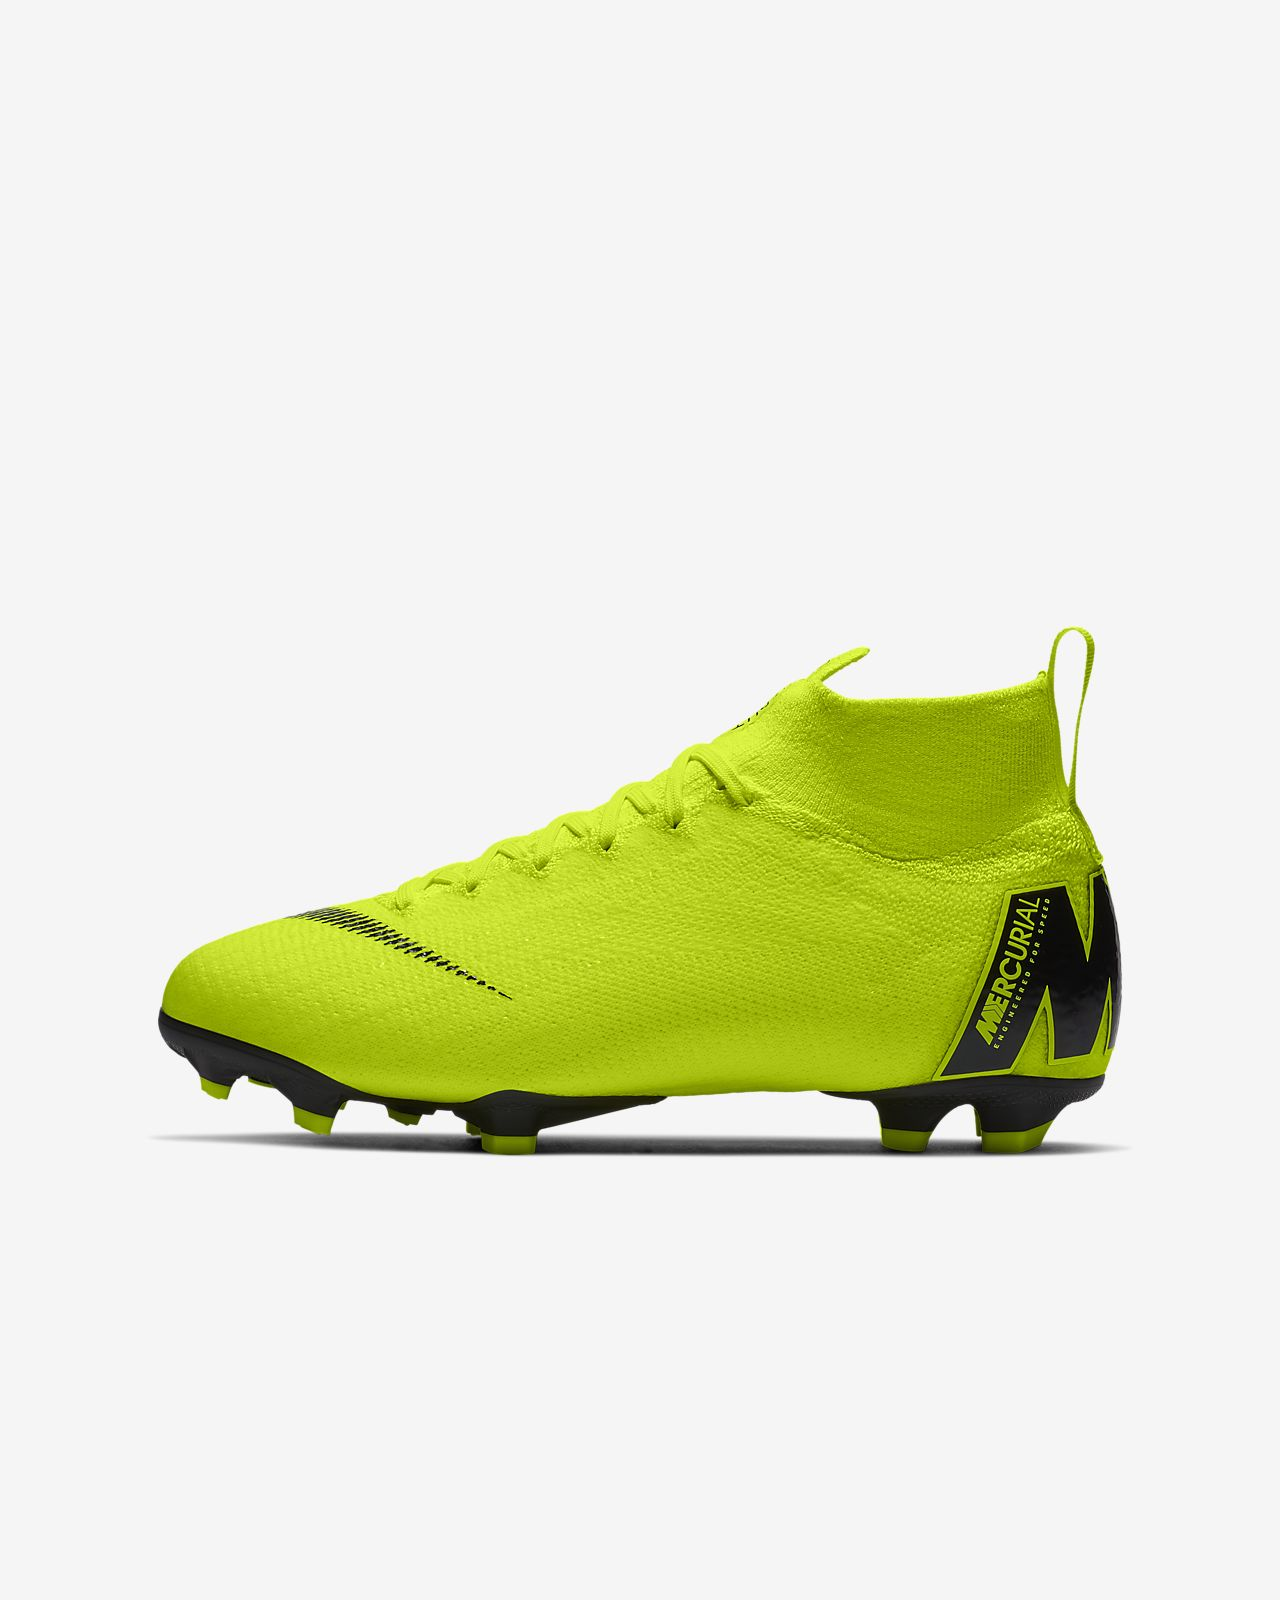 Nike Jr. Superfly 6 Elite FG Big Kids' Firm-Ground Soccer Cleat